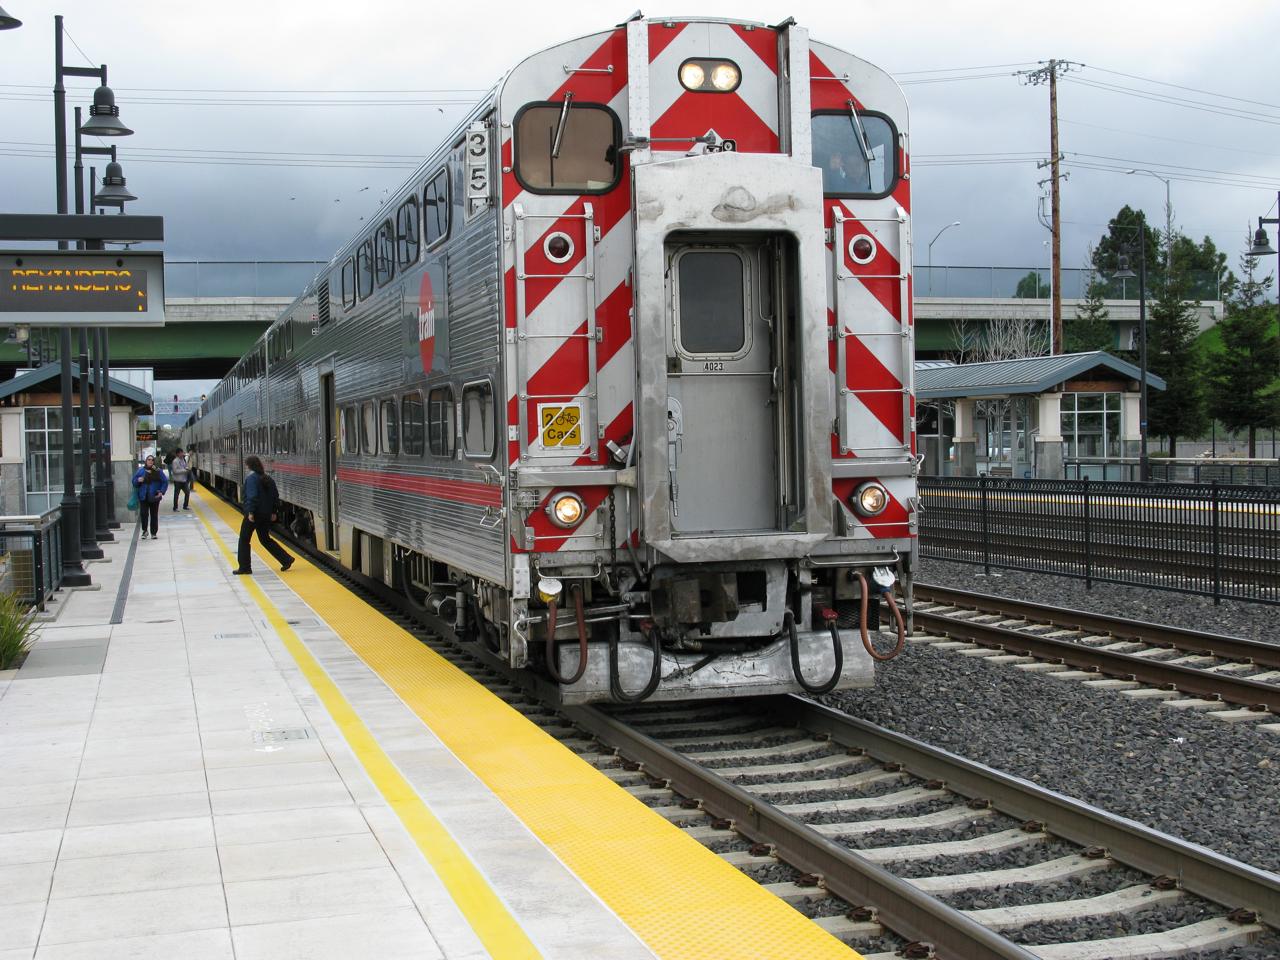 Lawrence Station Caltrain Wikipedia